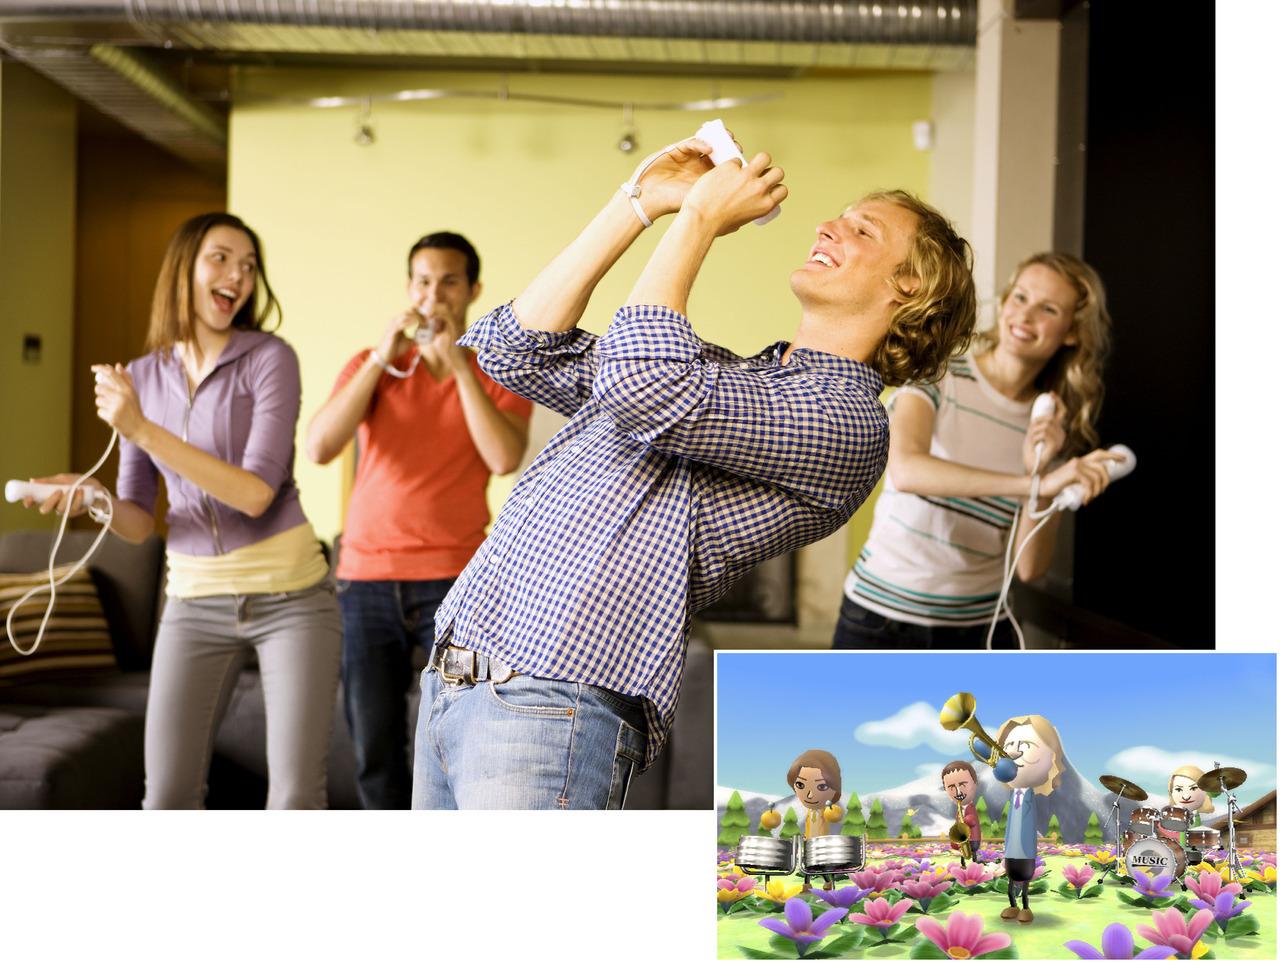 http://image.jeuxvideo.com/images/wi/w/i/wimuwi010.jpg